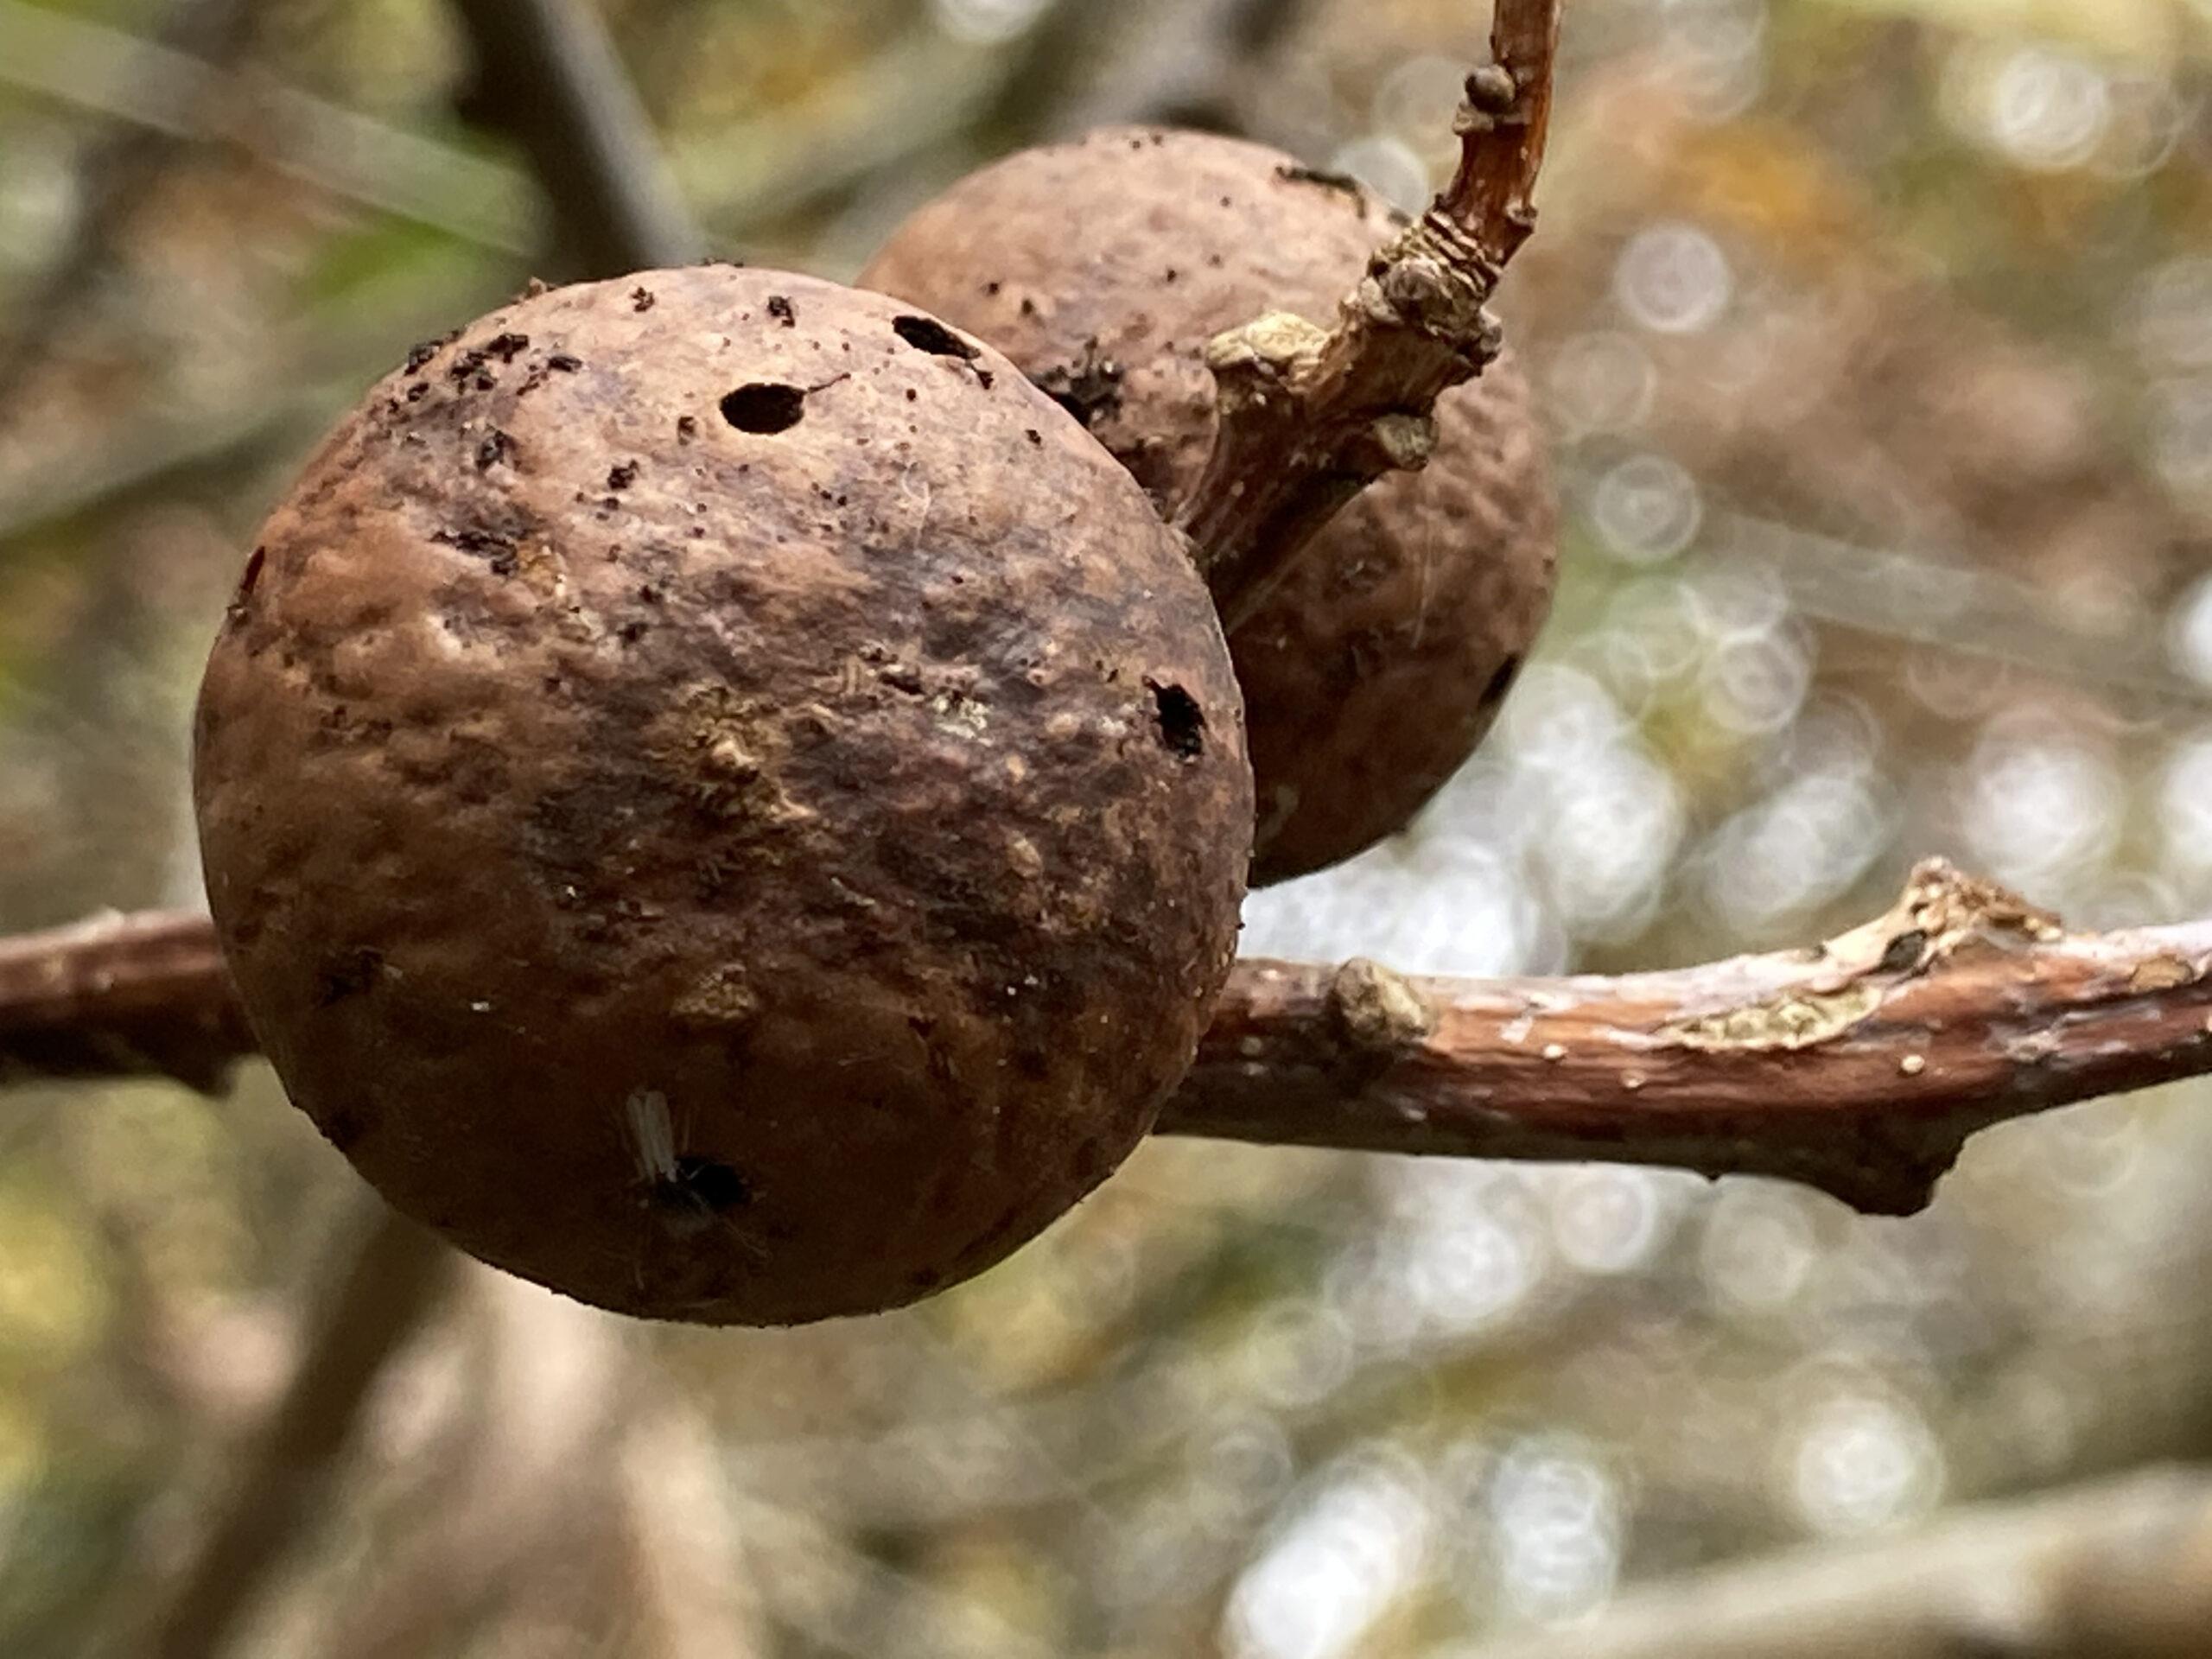 Oak Apples - the Gall of the Biorhiza pallida Wasp